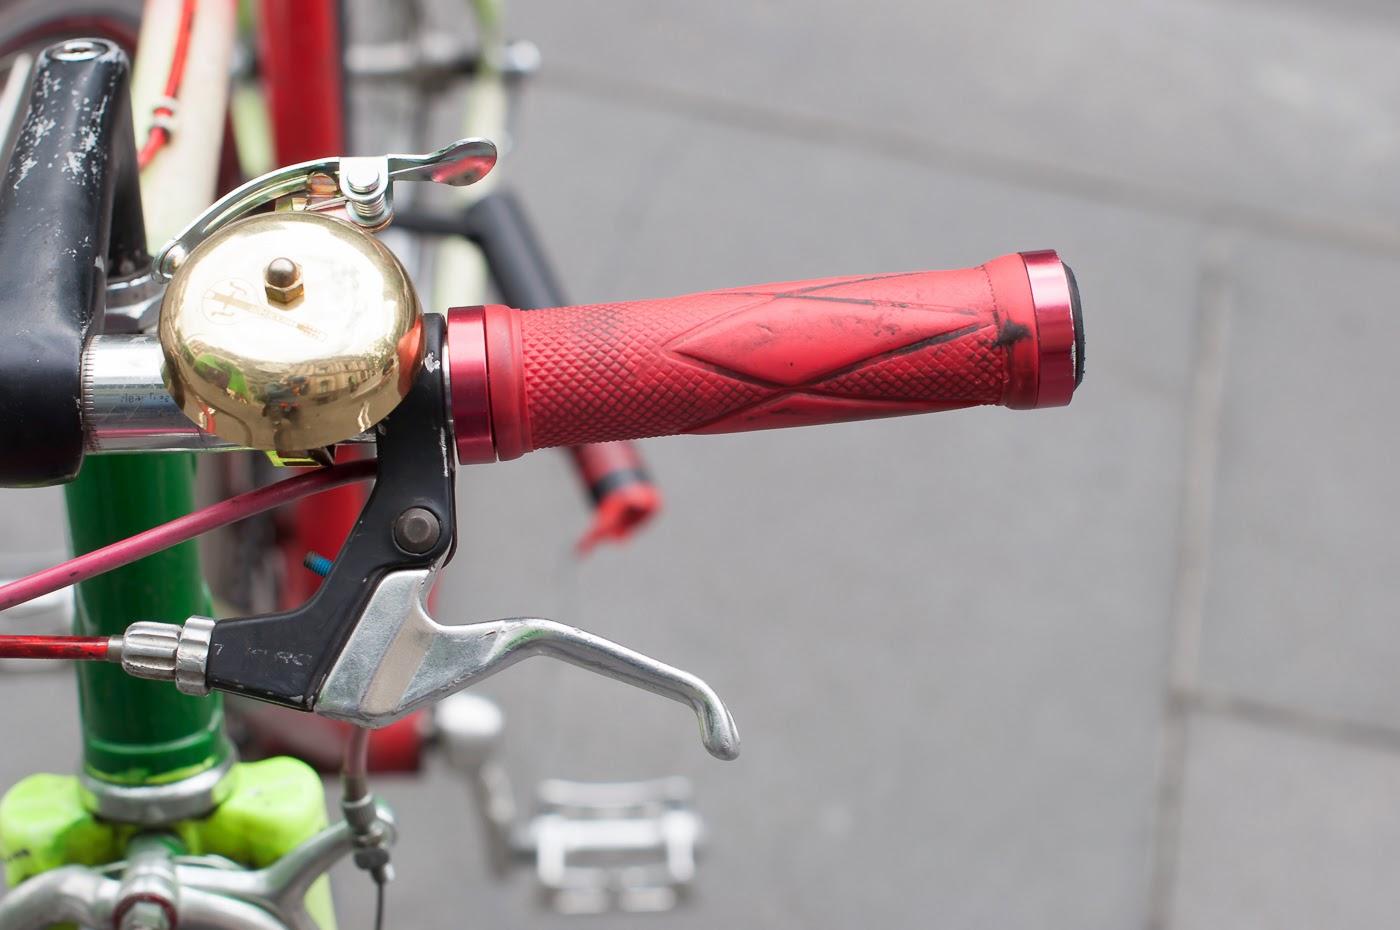 Pub bike, bike, bicycle, conversion, road bike, tim macauley, the biketorialist, Melbourne, Australia, swanston st, handlebar, bell